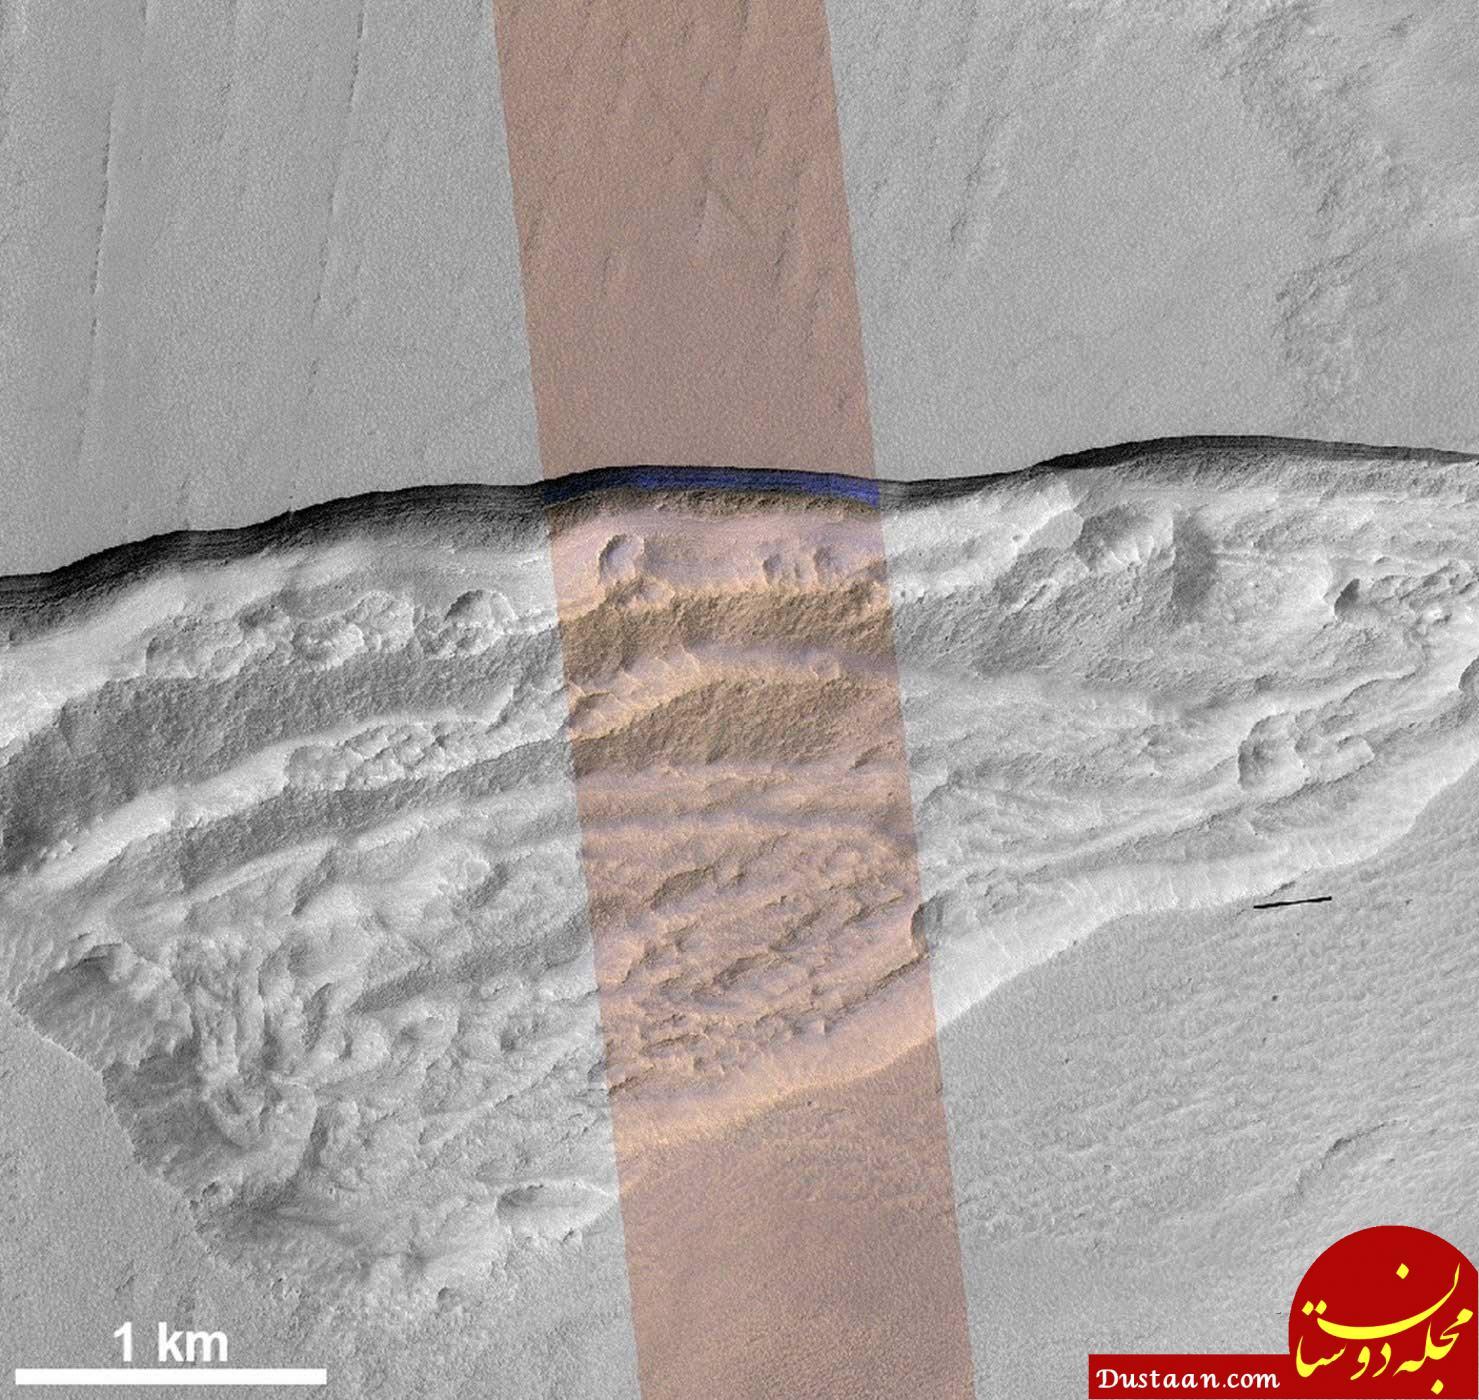 www.dustaan.com در سطح مریخ آب وجود دارد +تصاویر